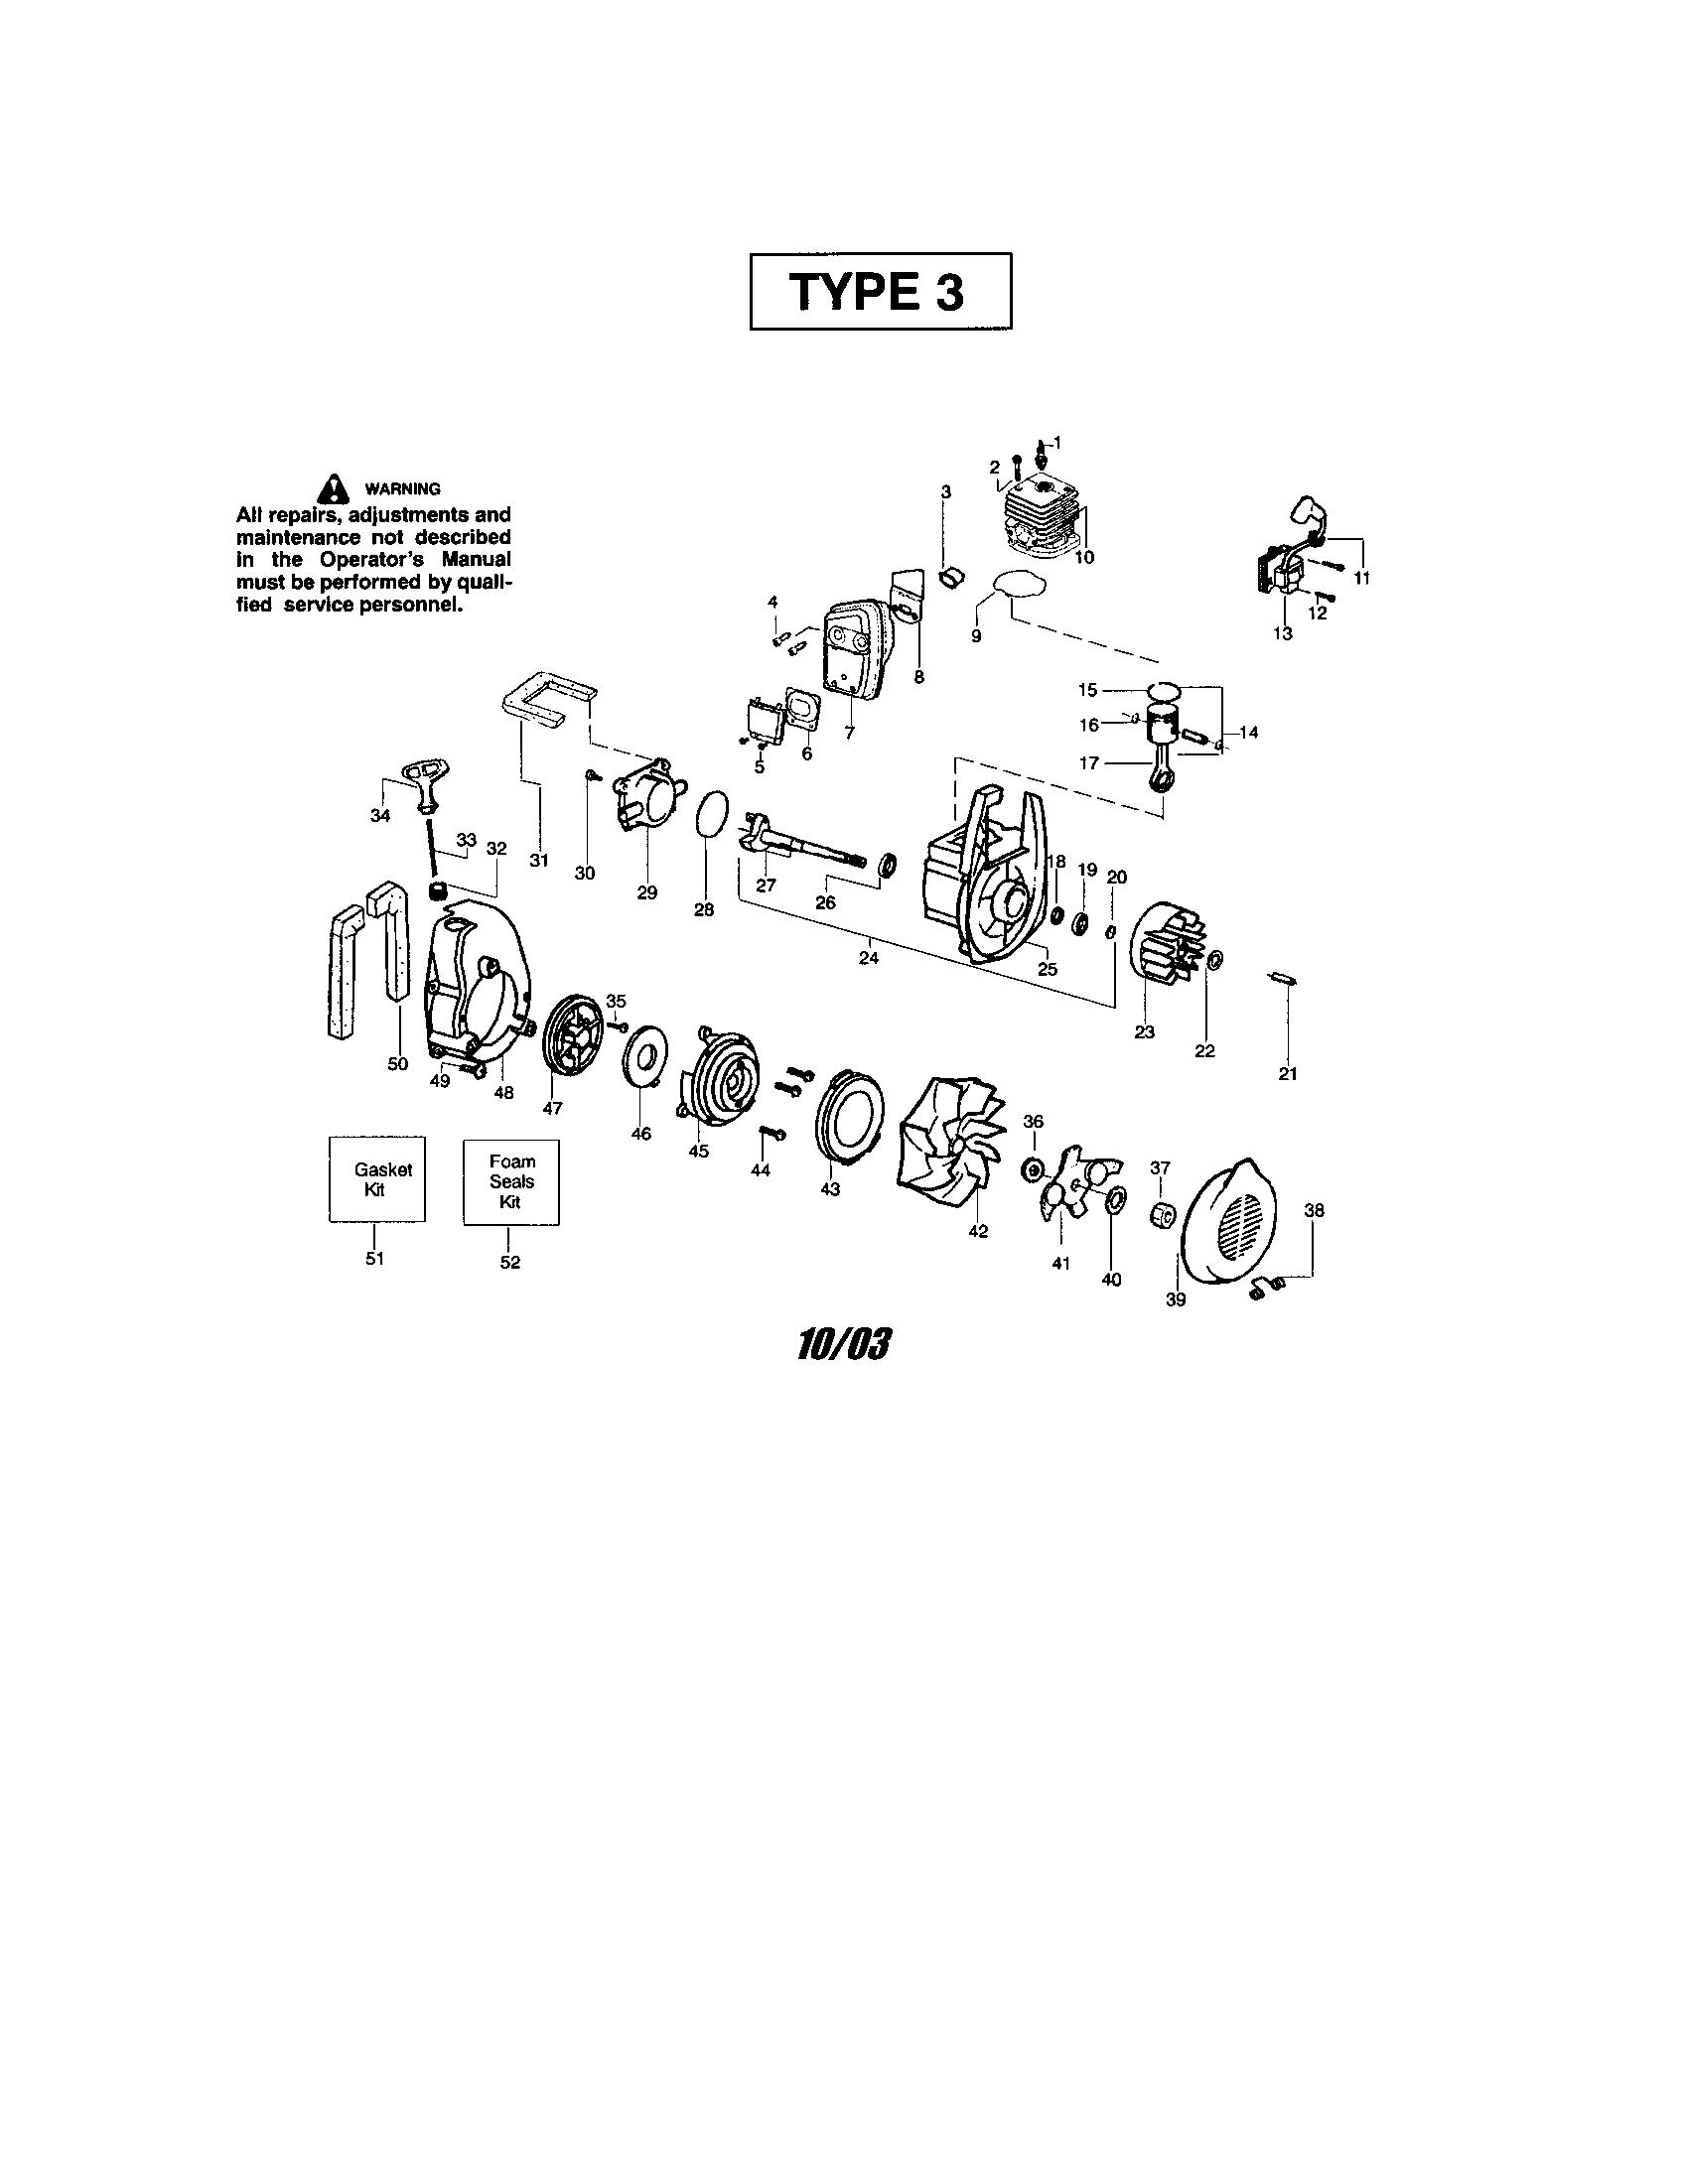 Weed-Eater model BV1650-TYPE 3 blower, gas genuine parts